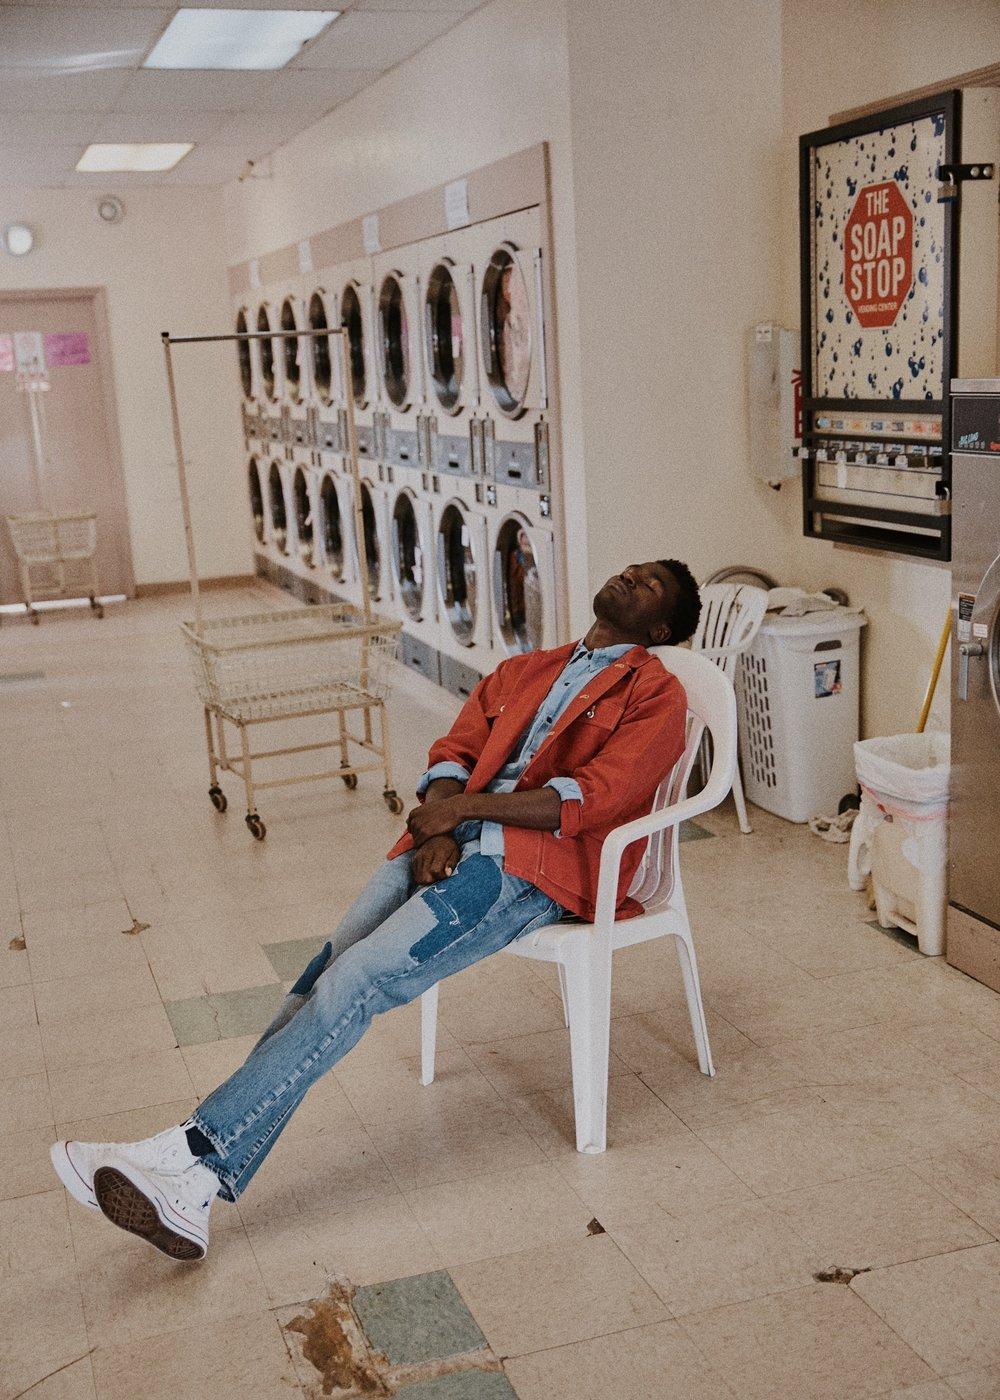 10_01_Laundromat-Arturo-Suzy-014_w.JPEG